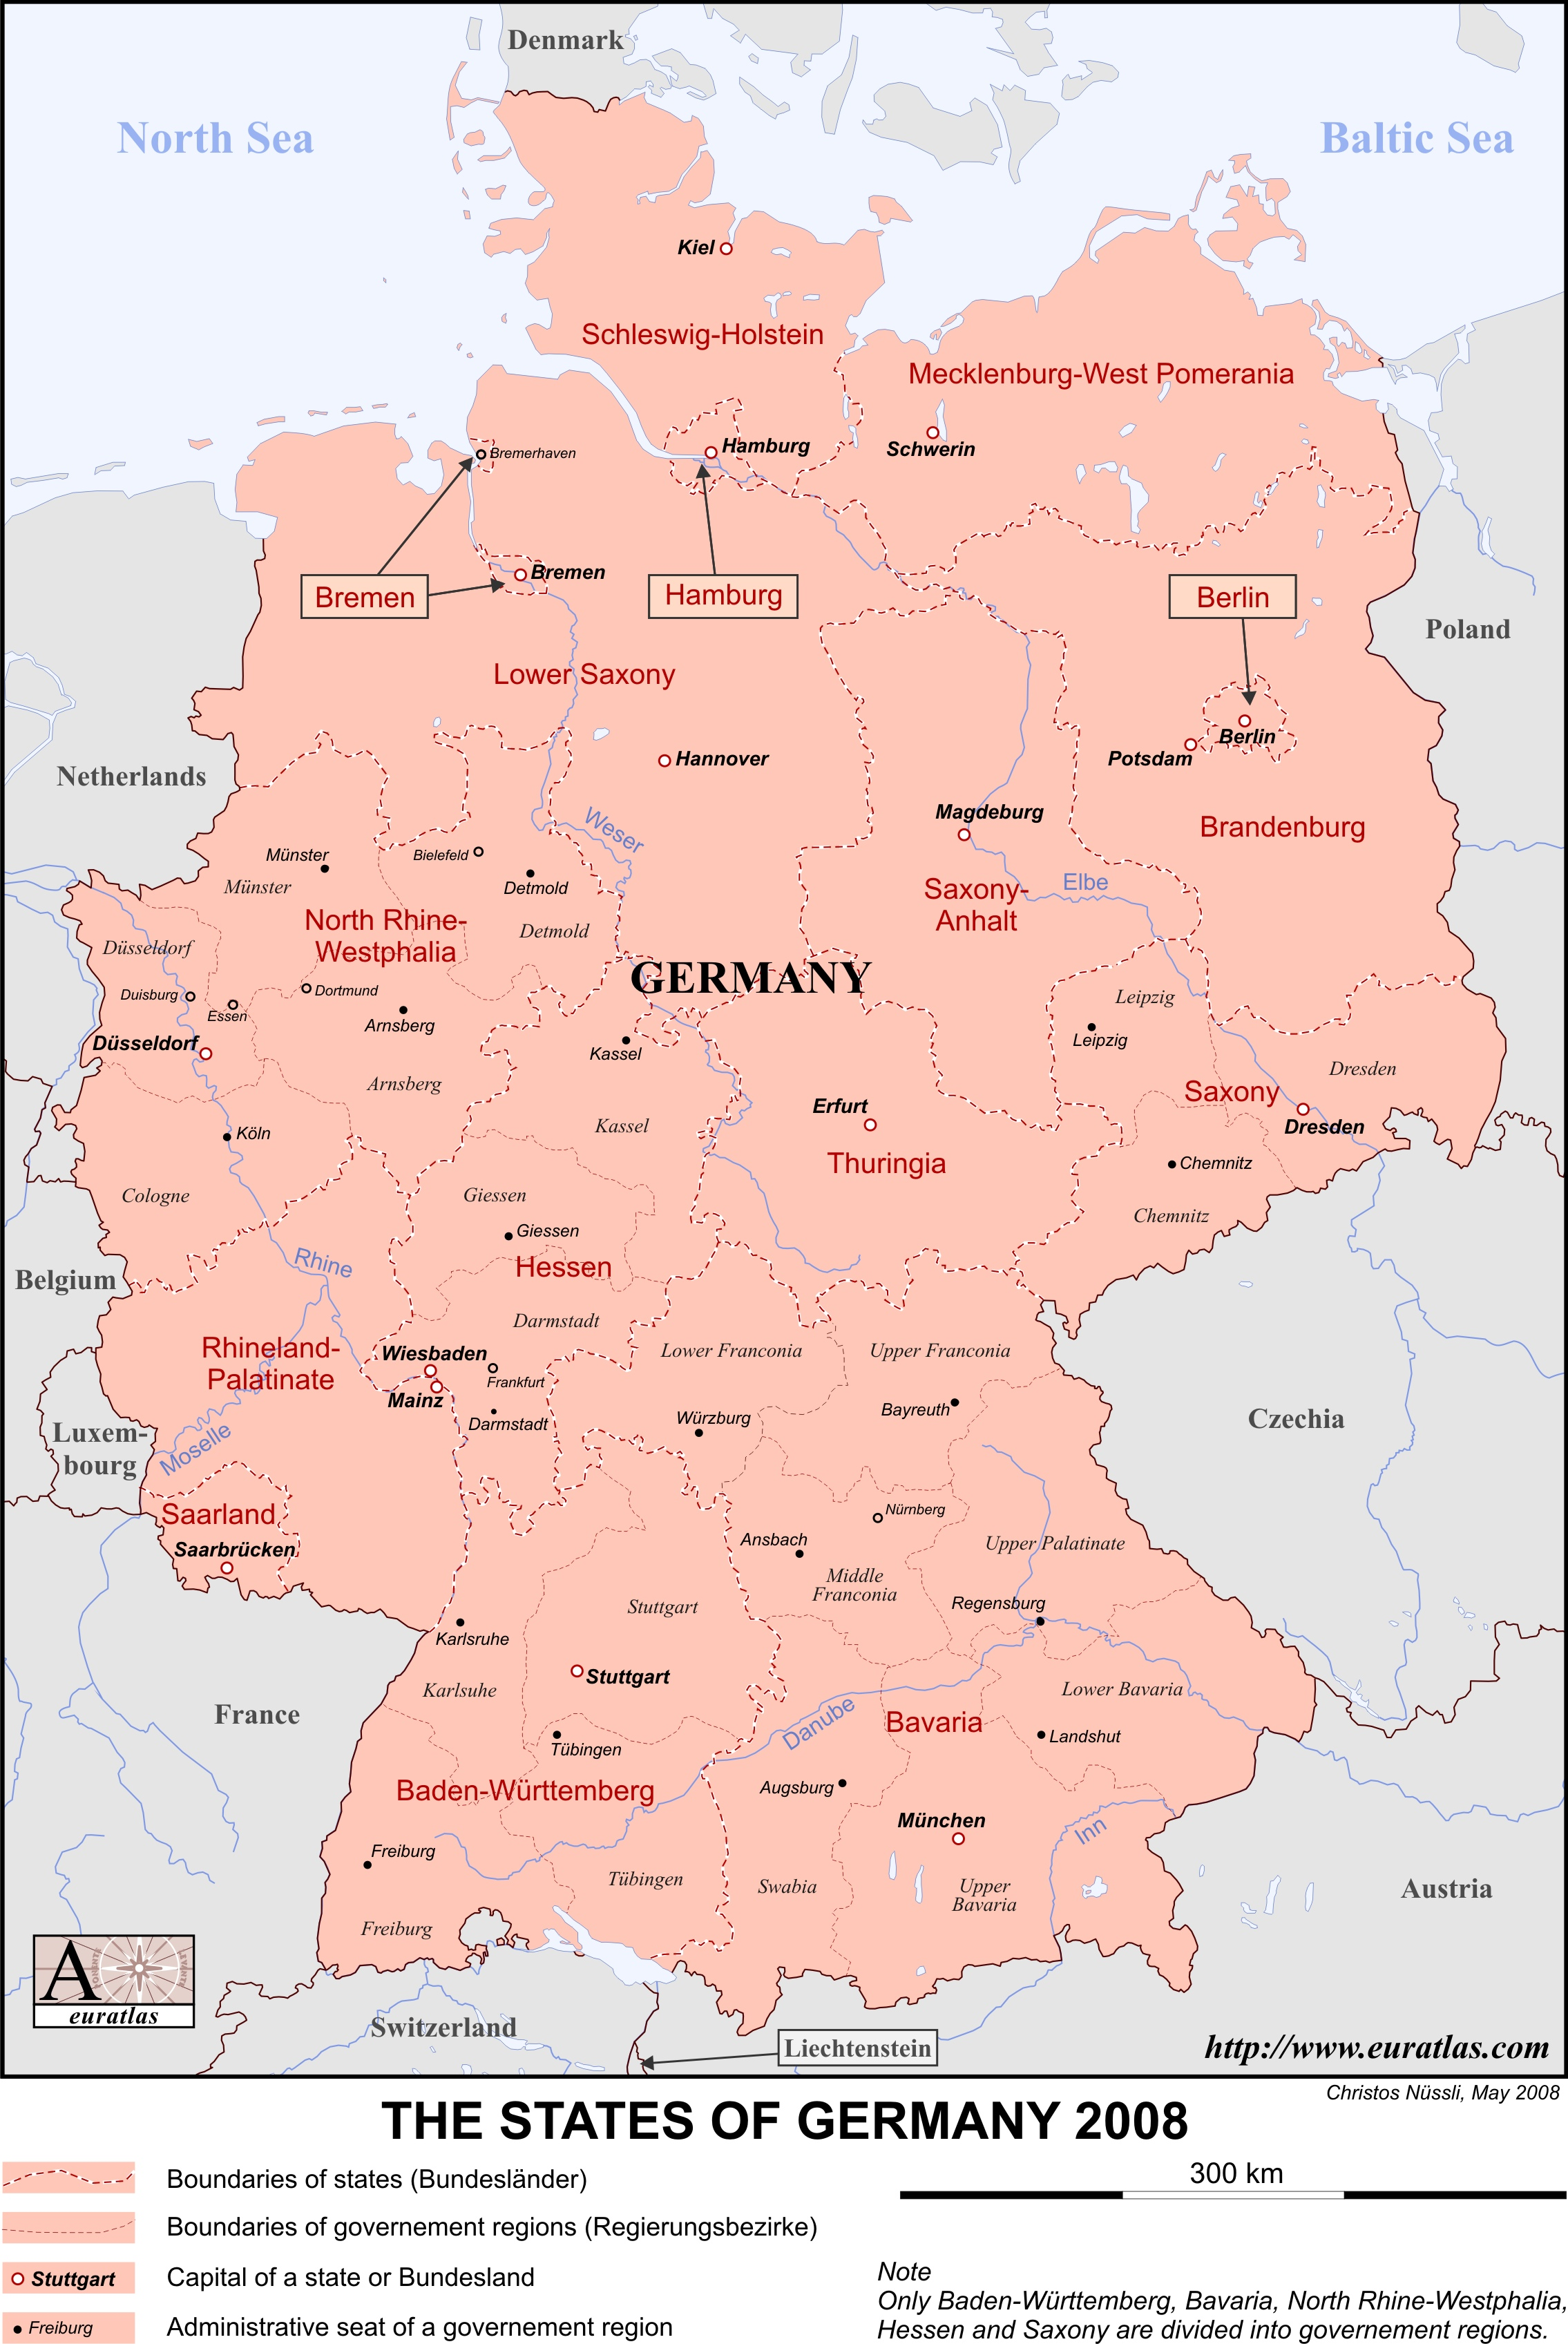 Map Of Germany To Color.Euratlas Info Member S Area Germany En Lab Col